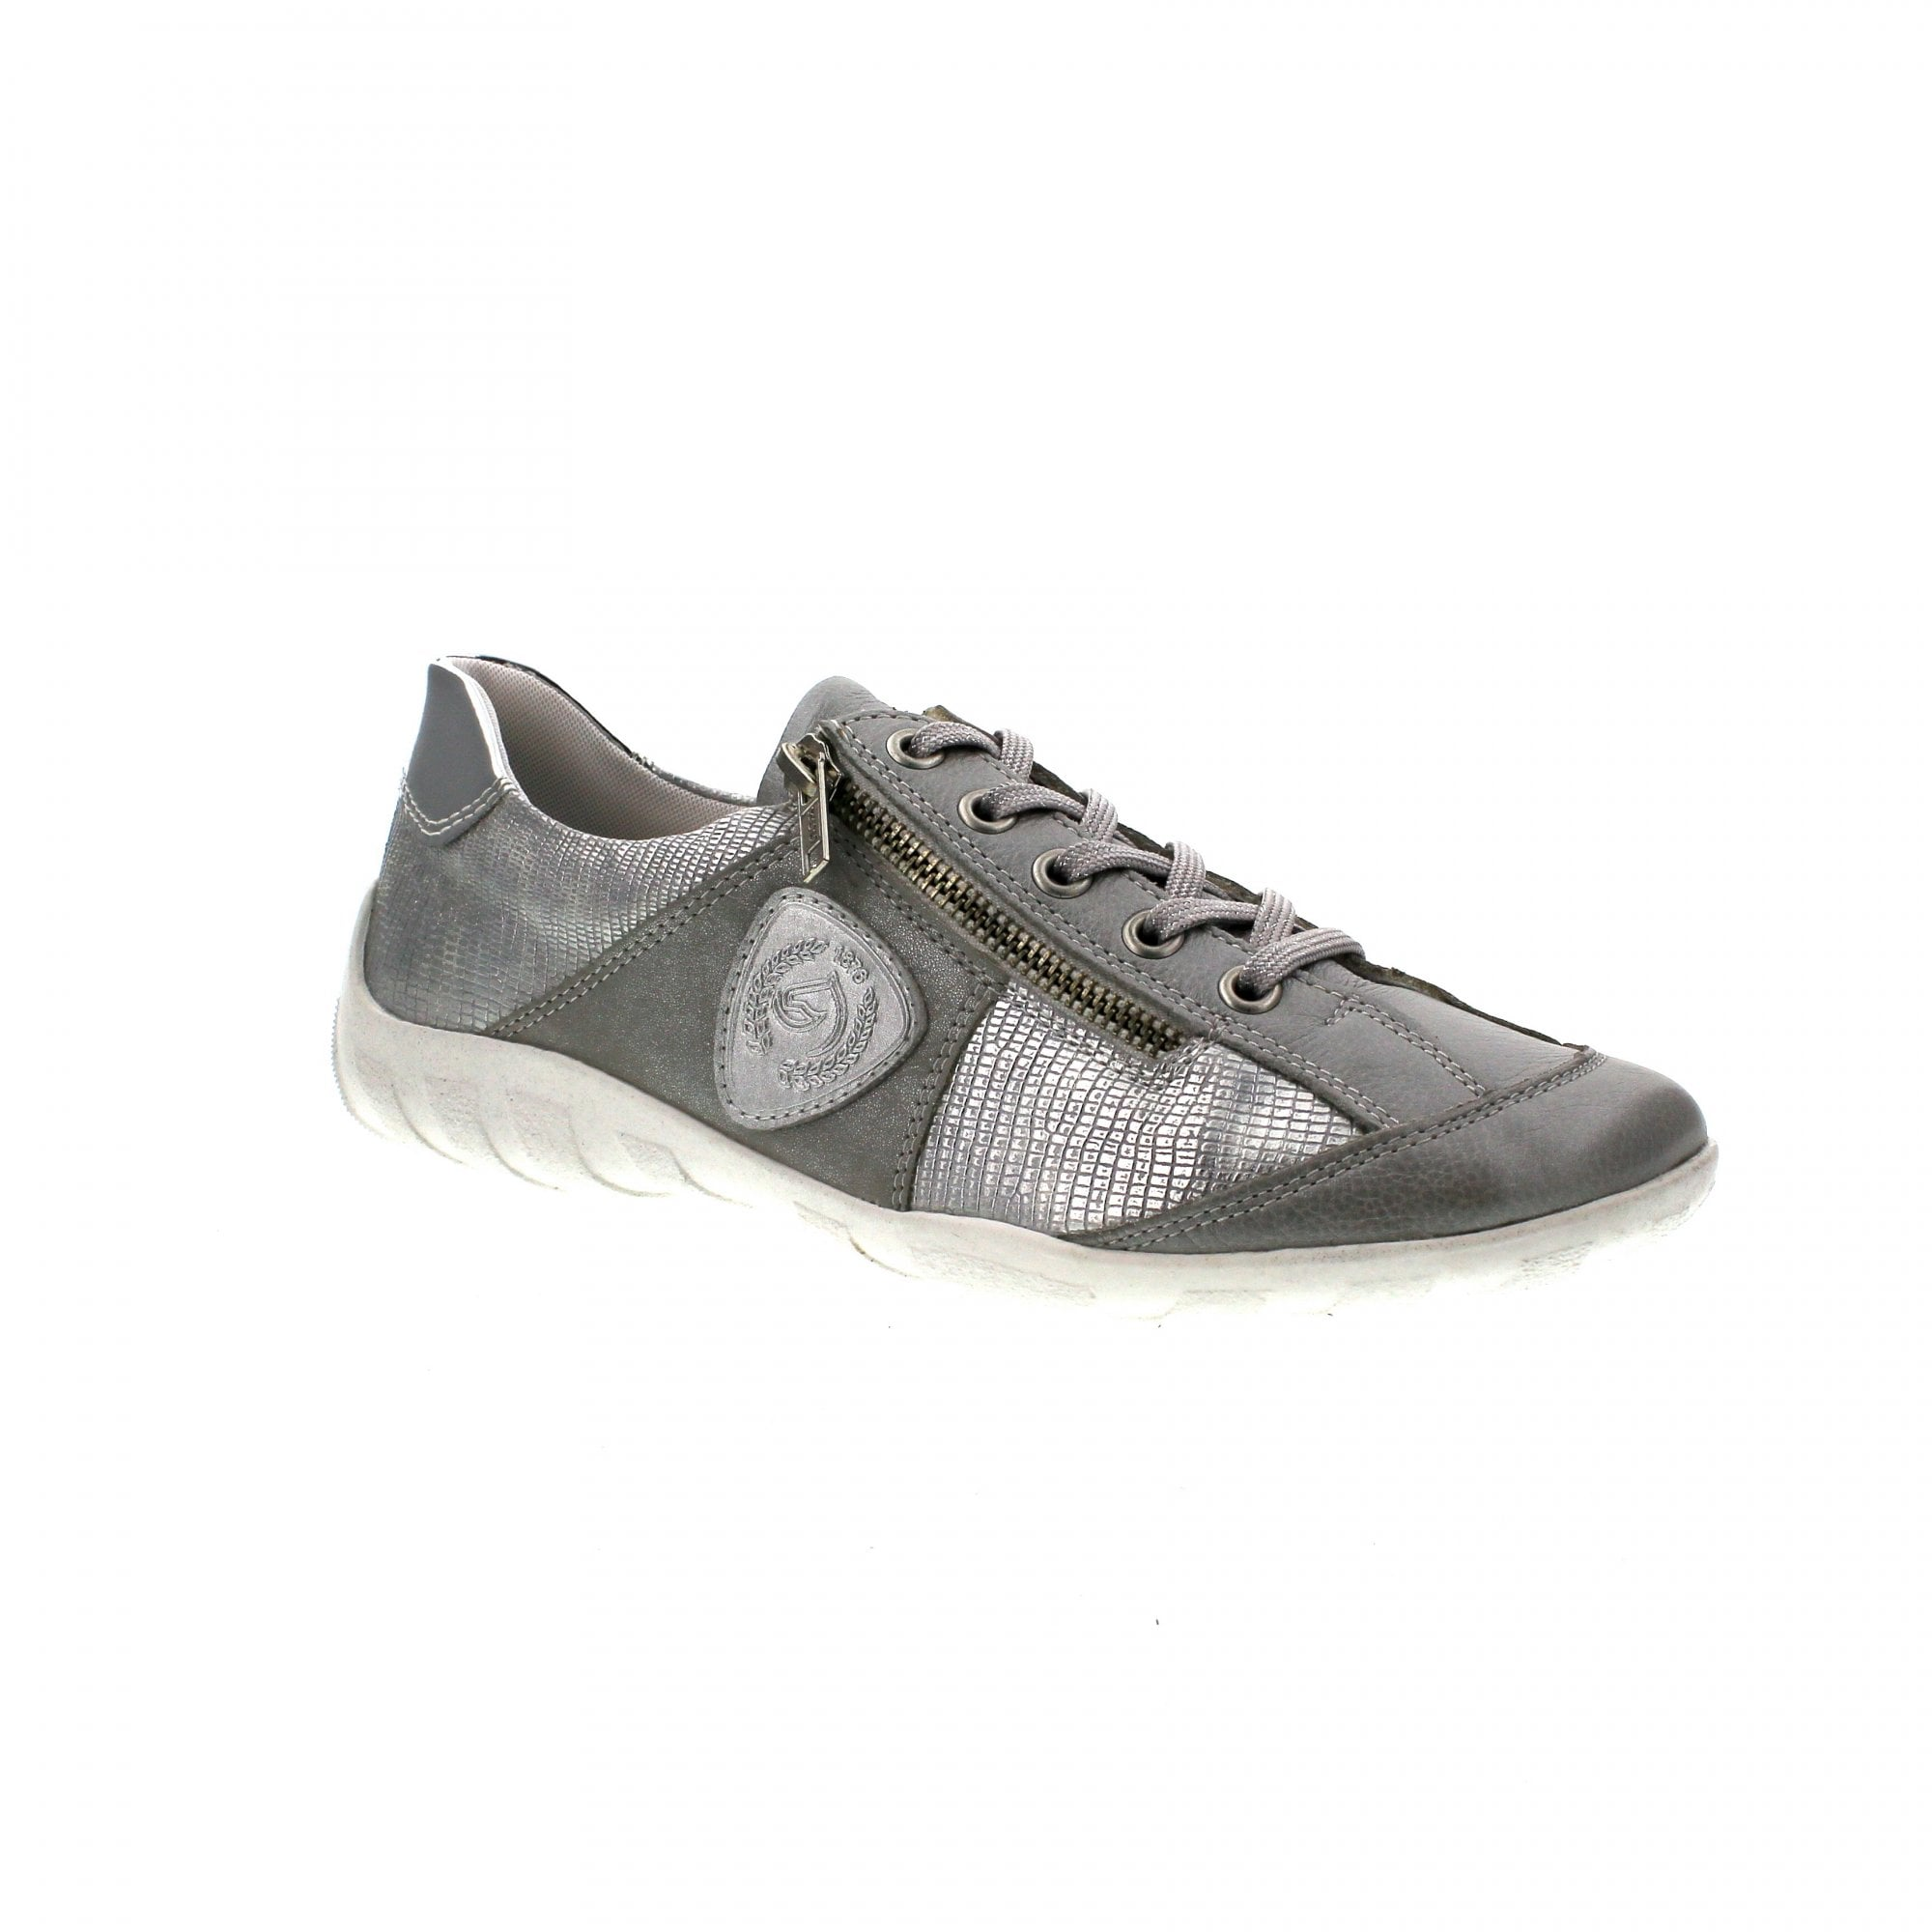 Remonte R3409-90 Grey/Silver Womens